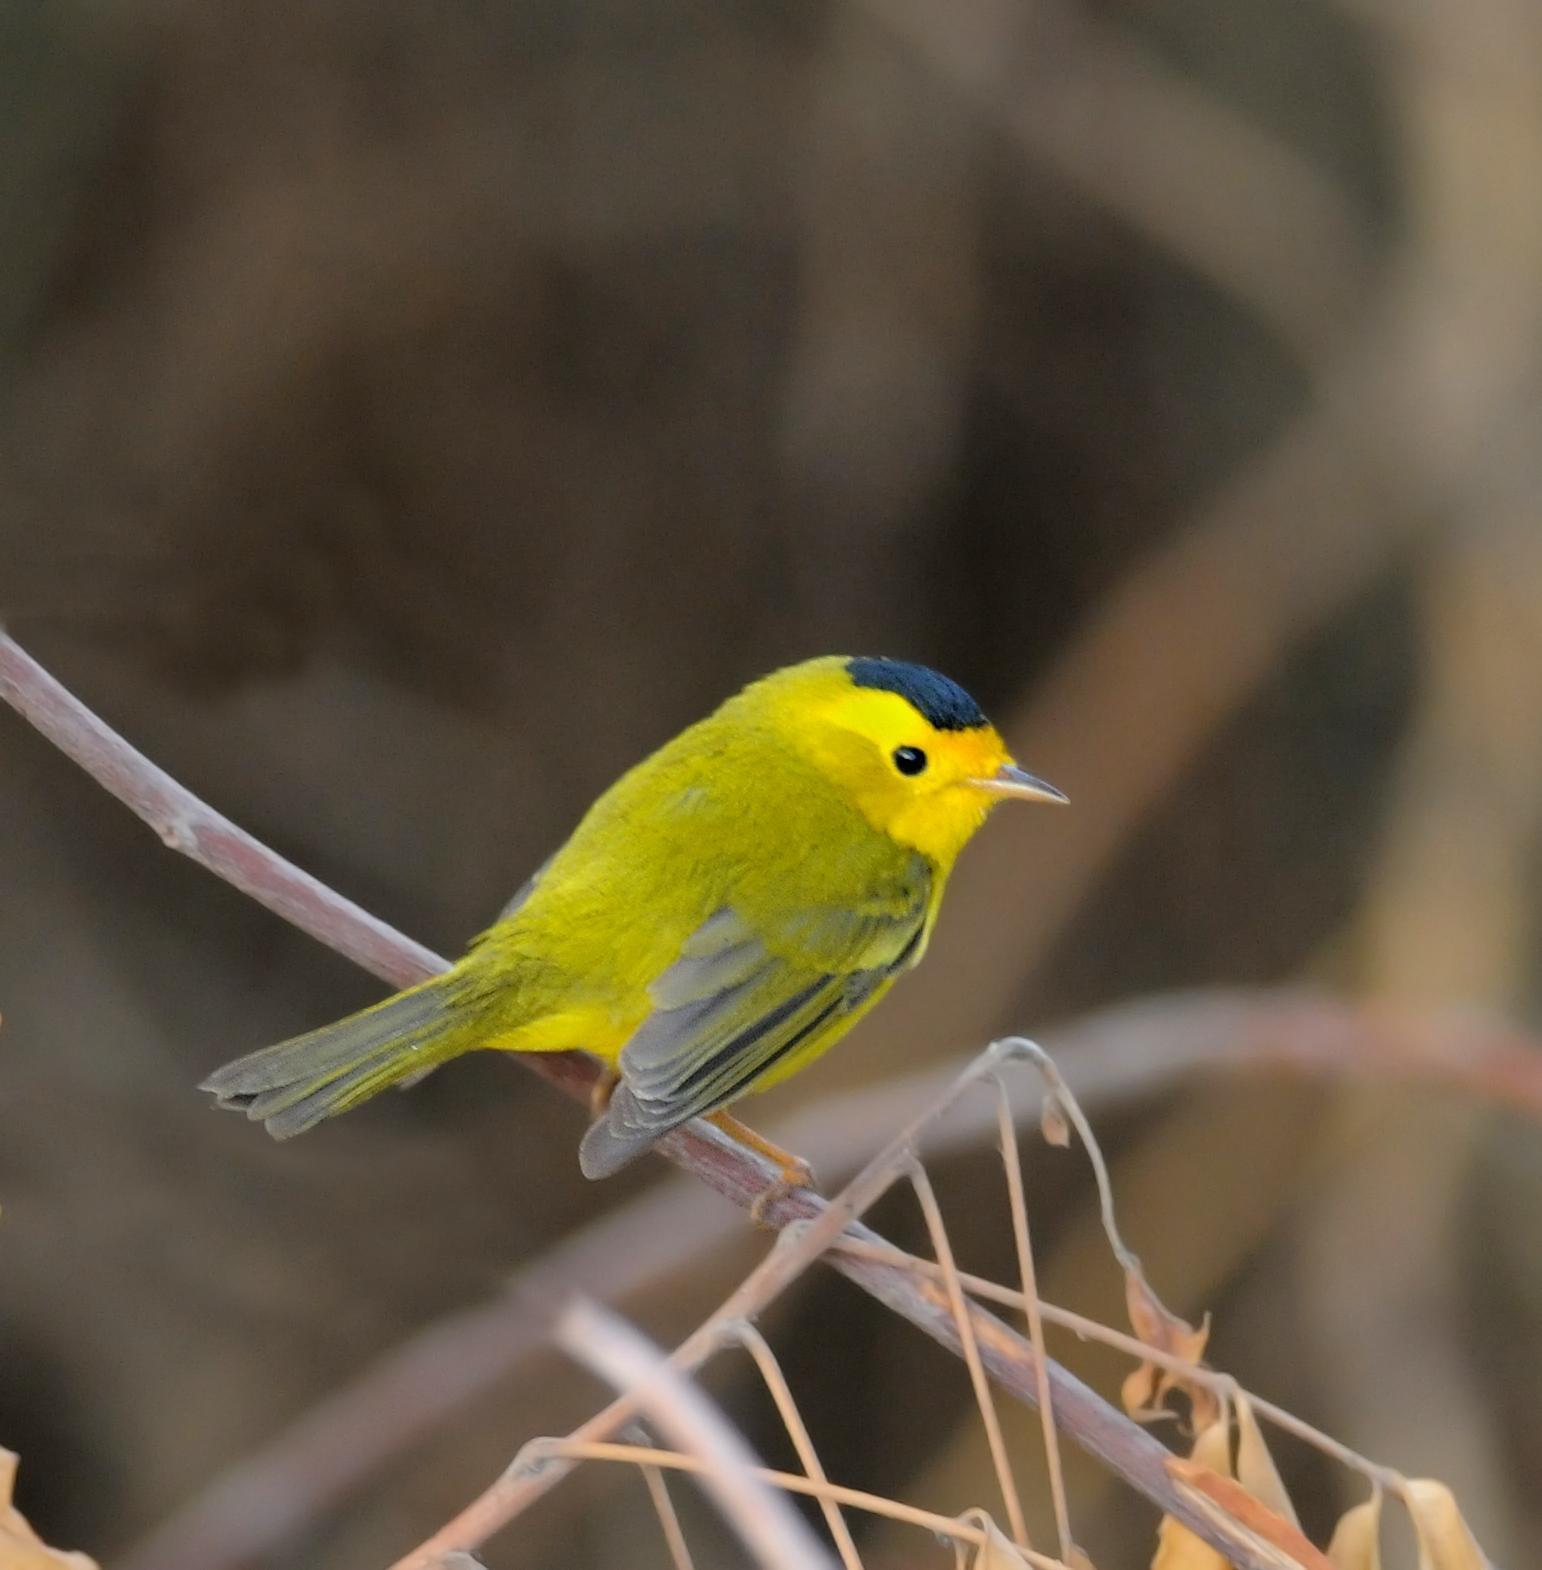 Wilson's Warbler Photo by Steven Mlodinow